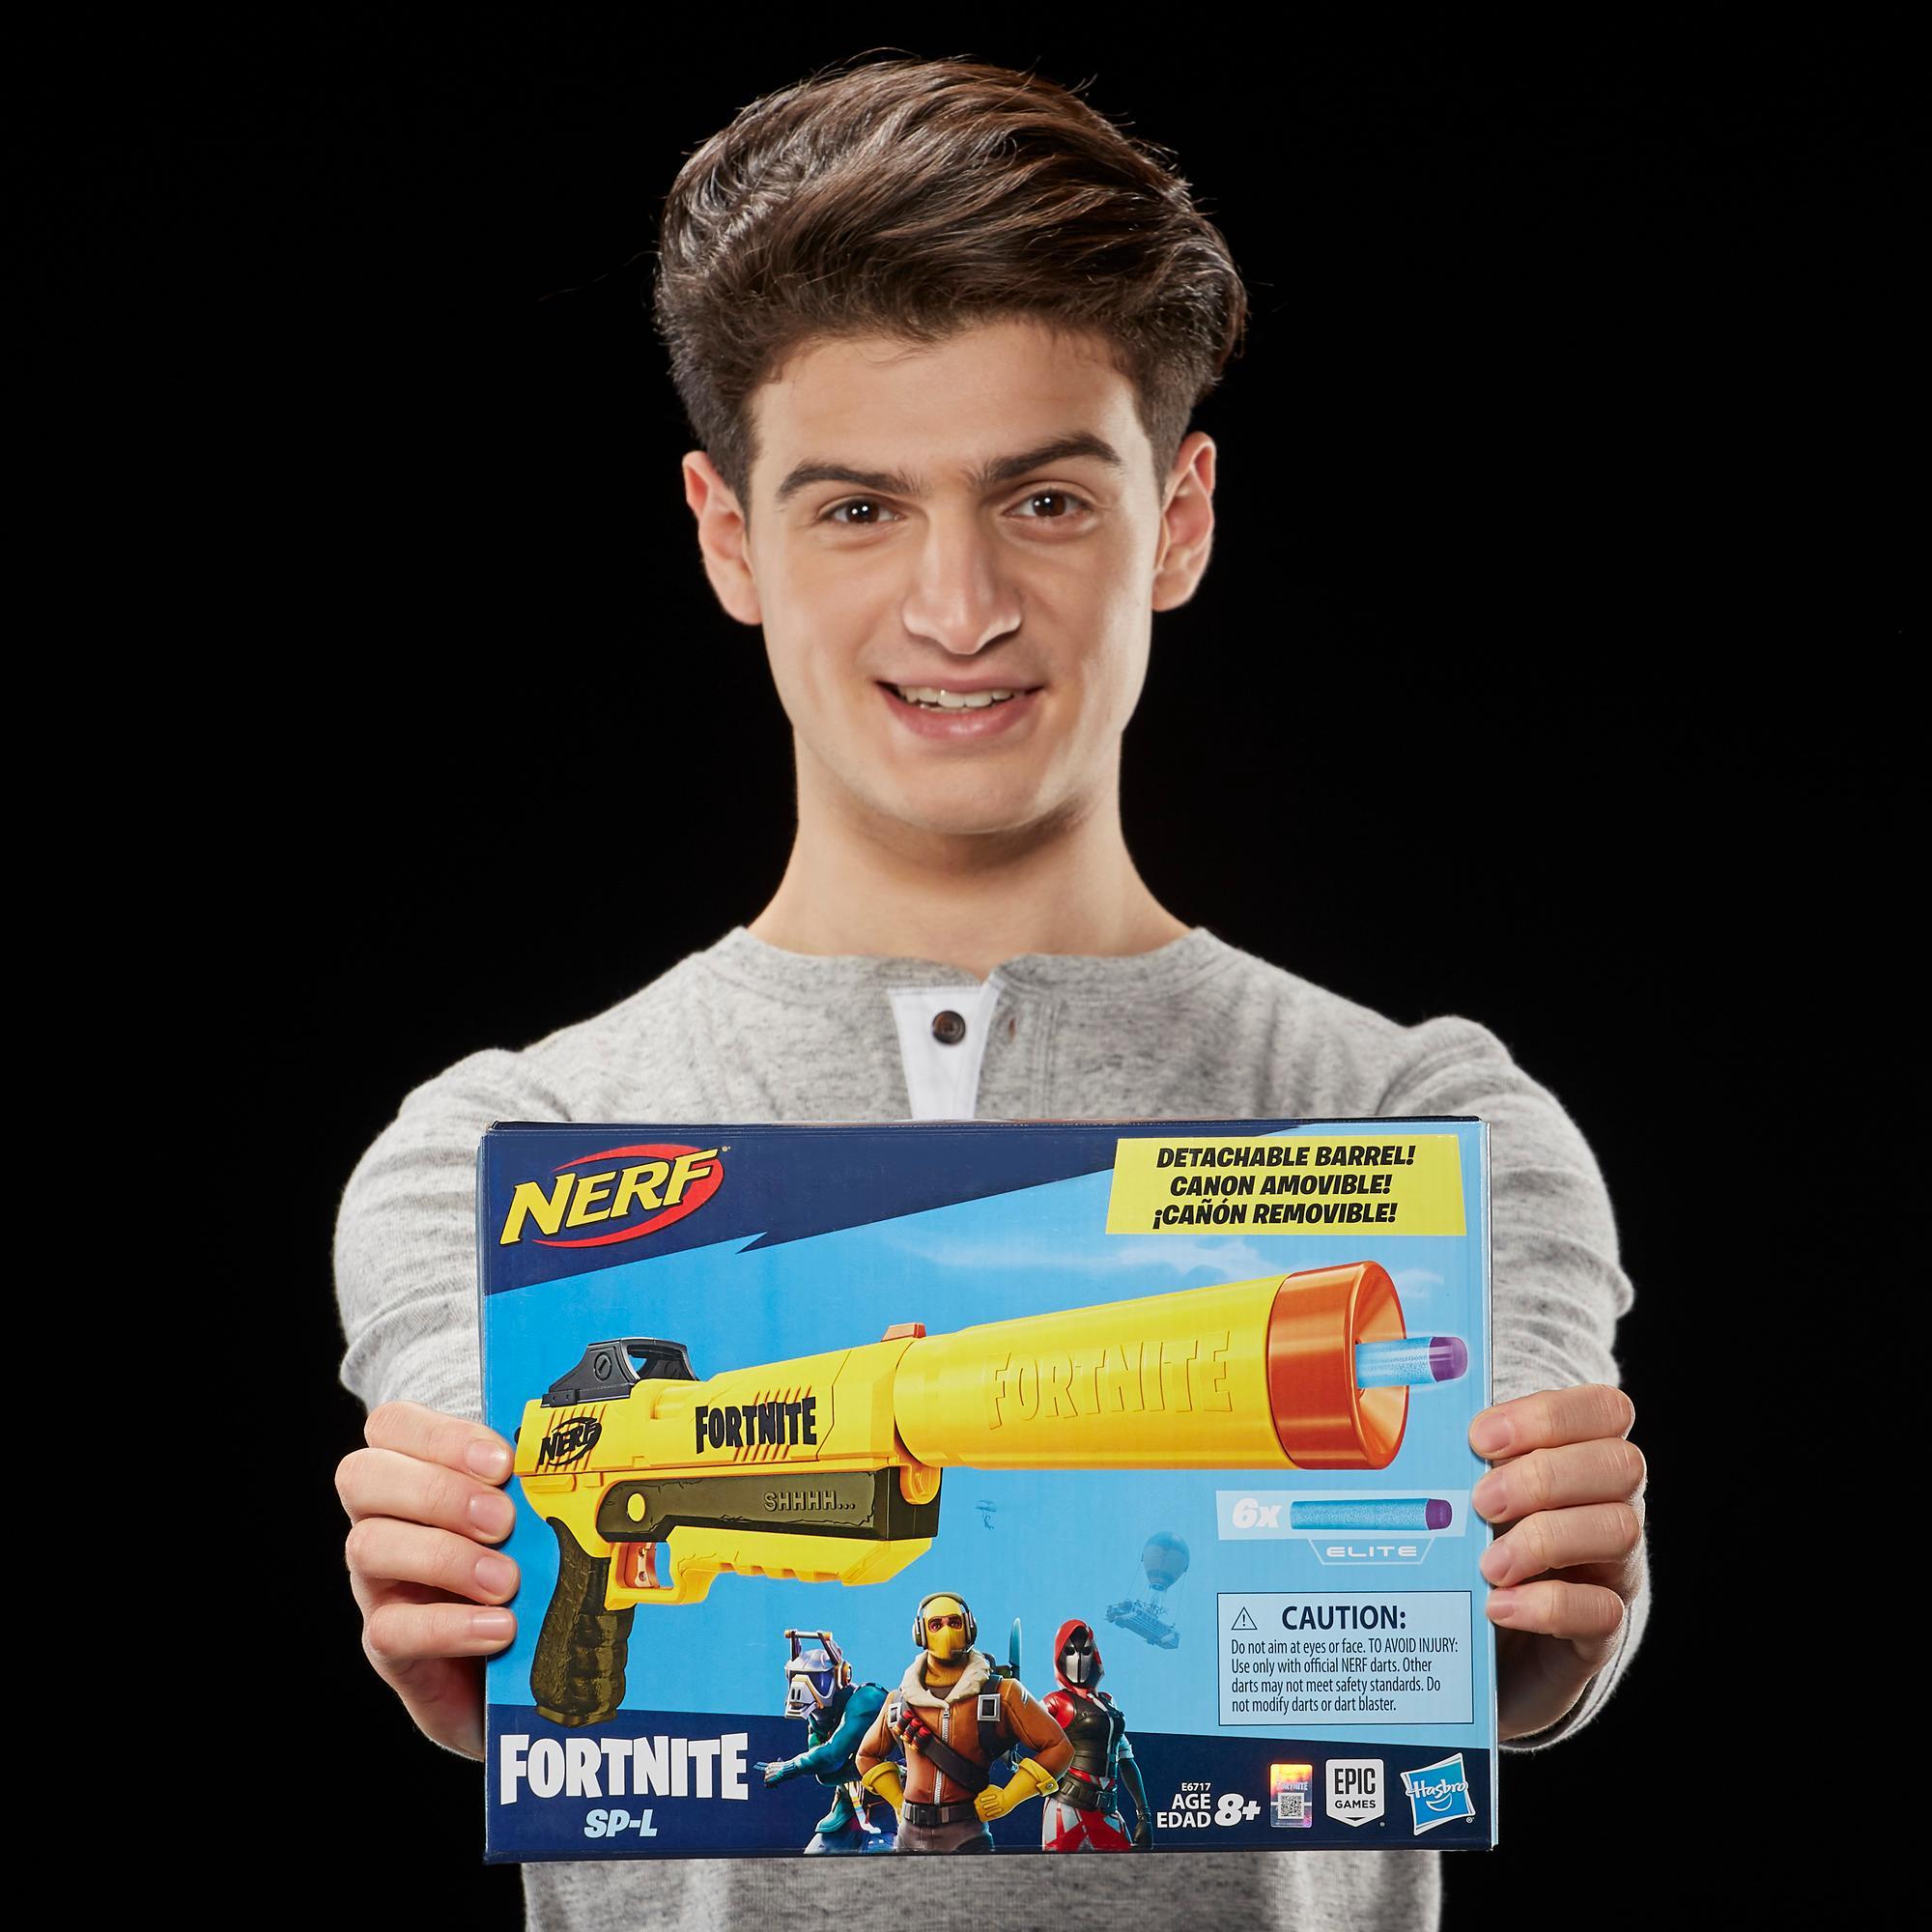 Nerf Elite Fortnite SP-L Blaster